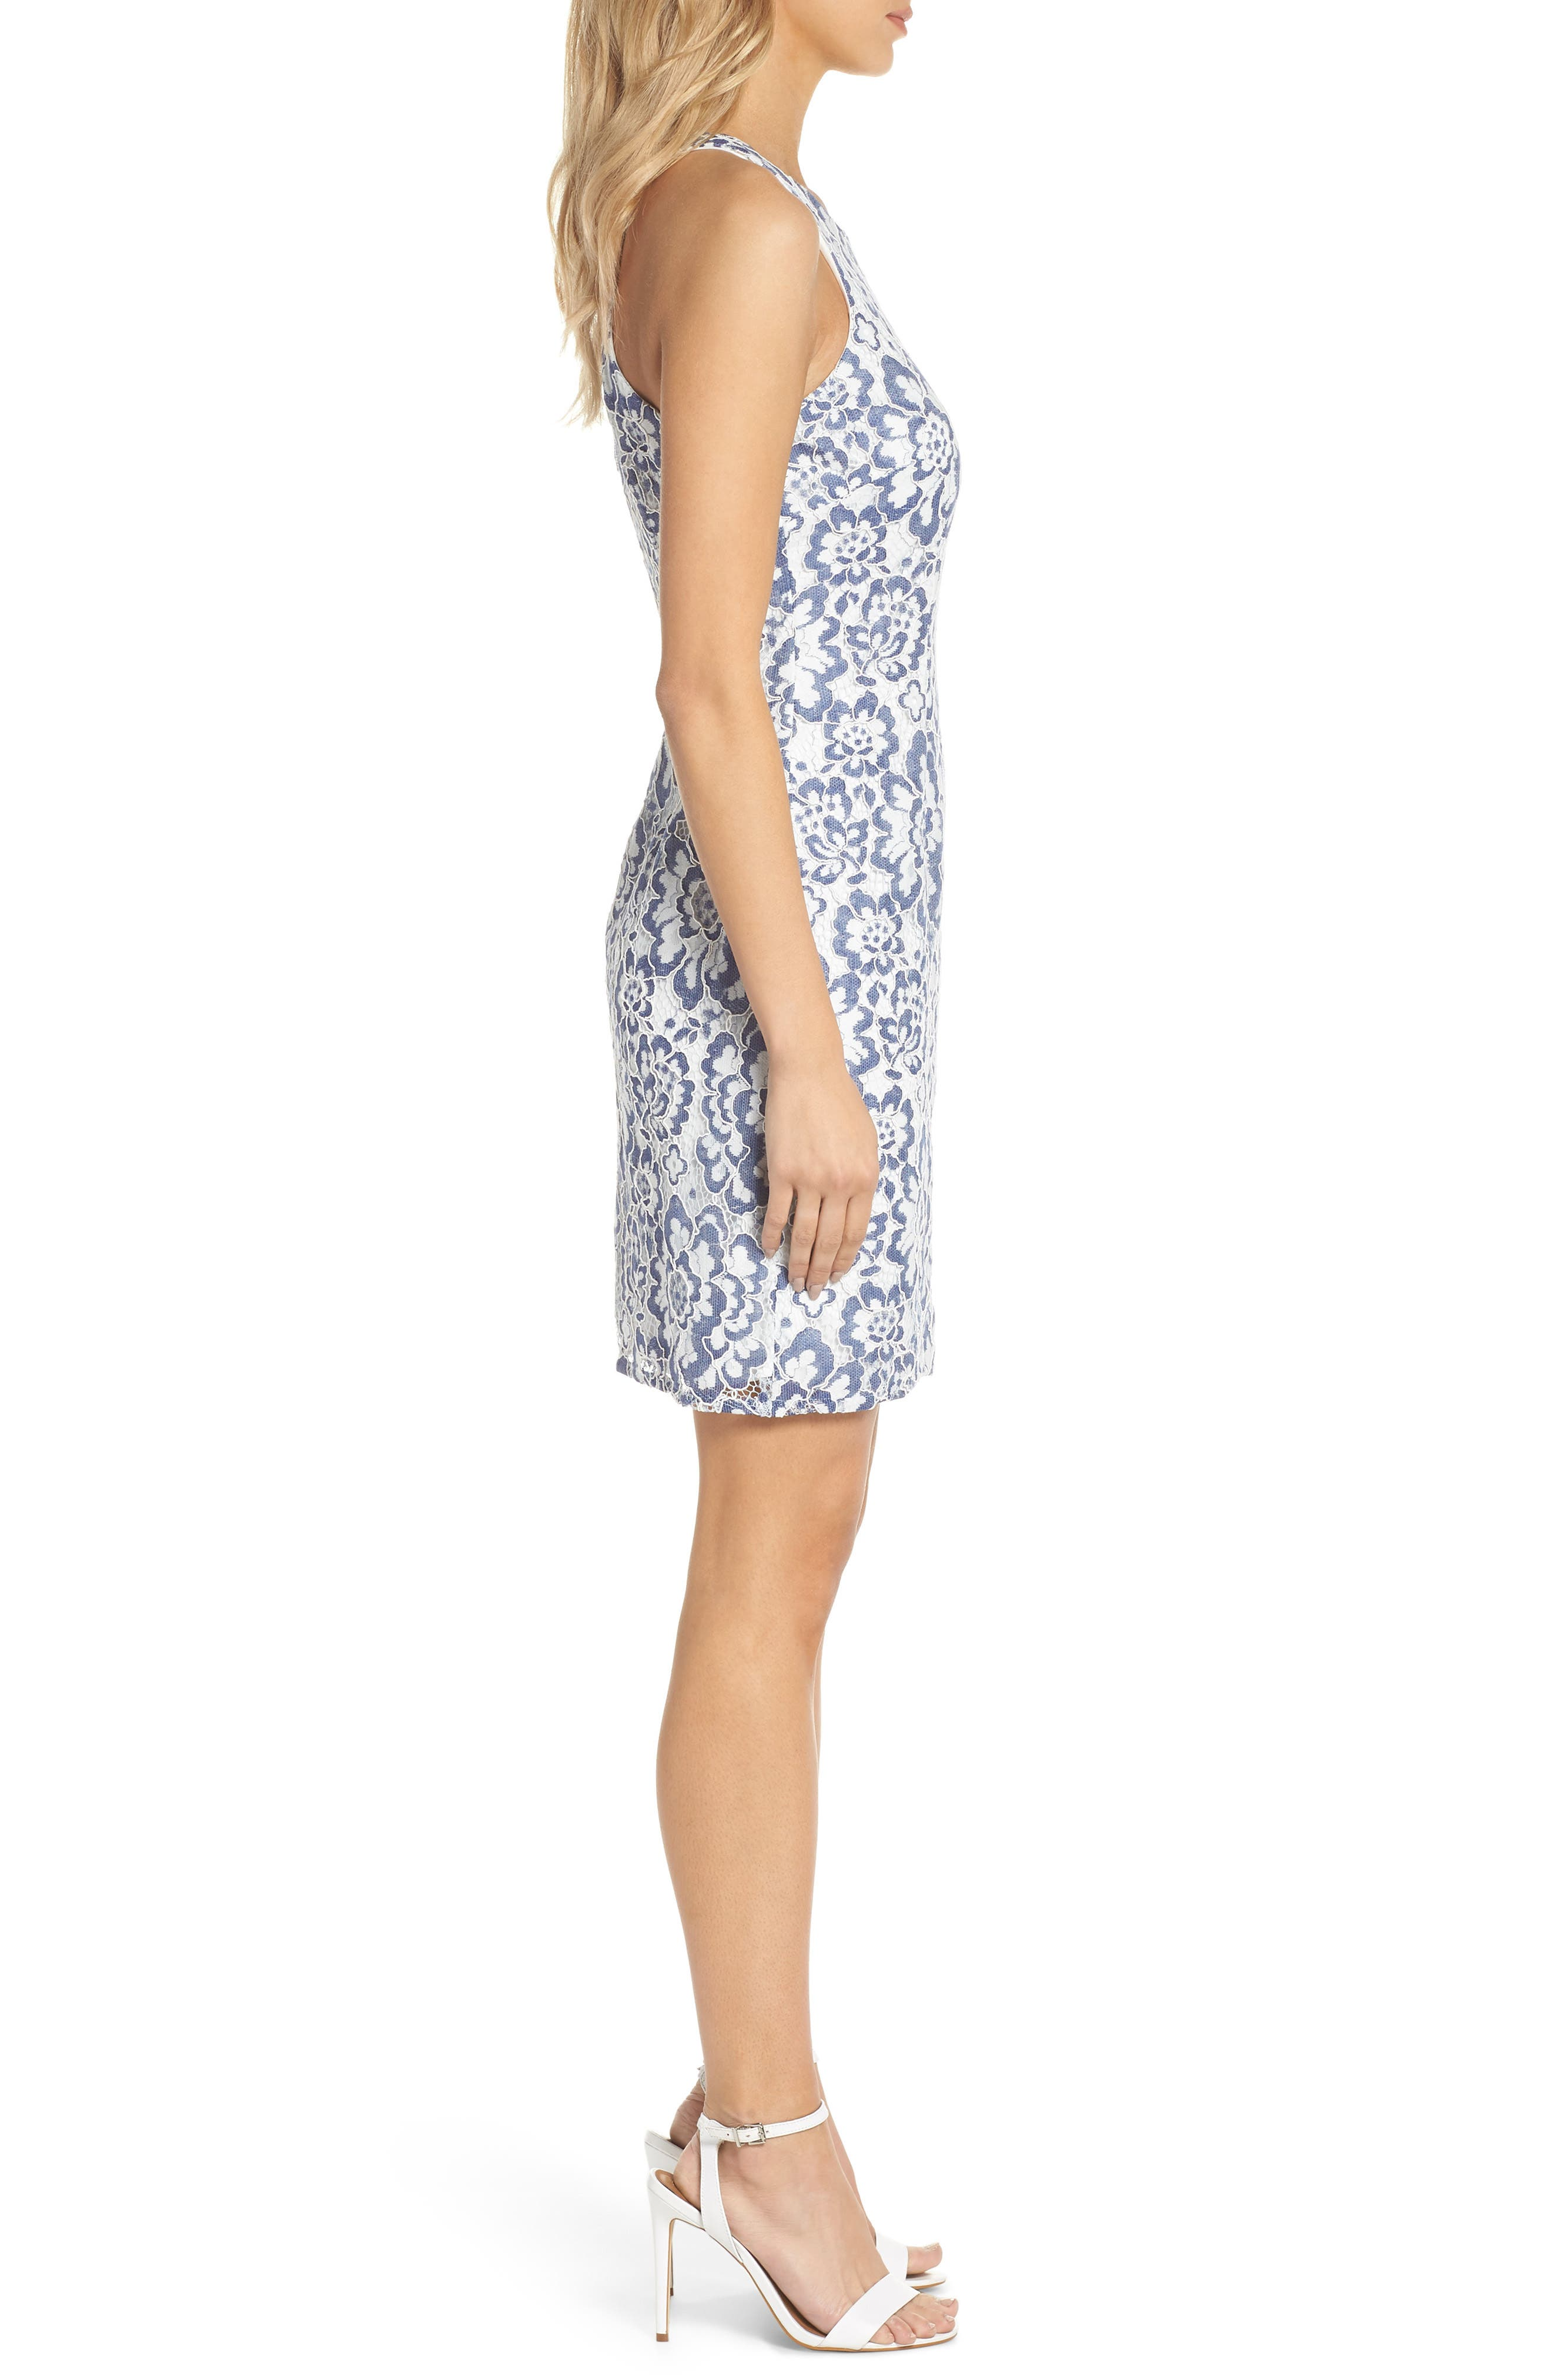 ADRIANNA PAPELL,                             Elisa Two Tone Lace Sheath Dress,                             Alternate thumbnail 3, color,                             481